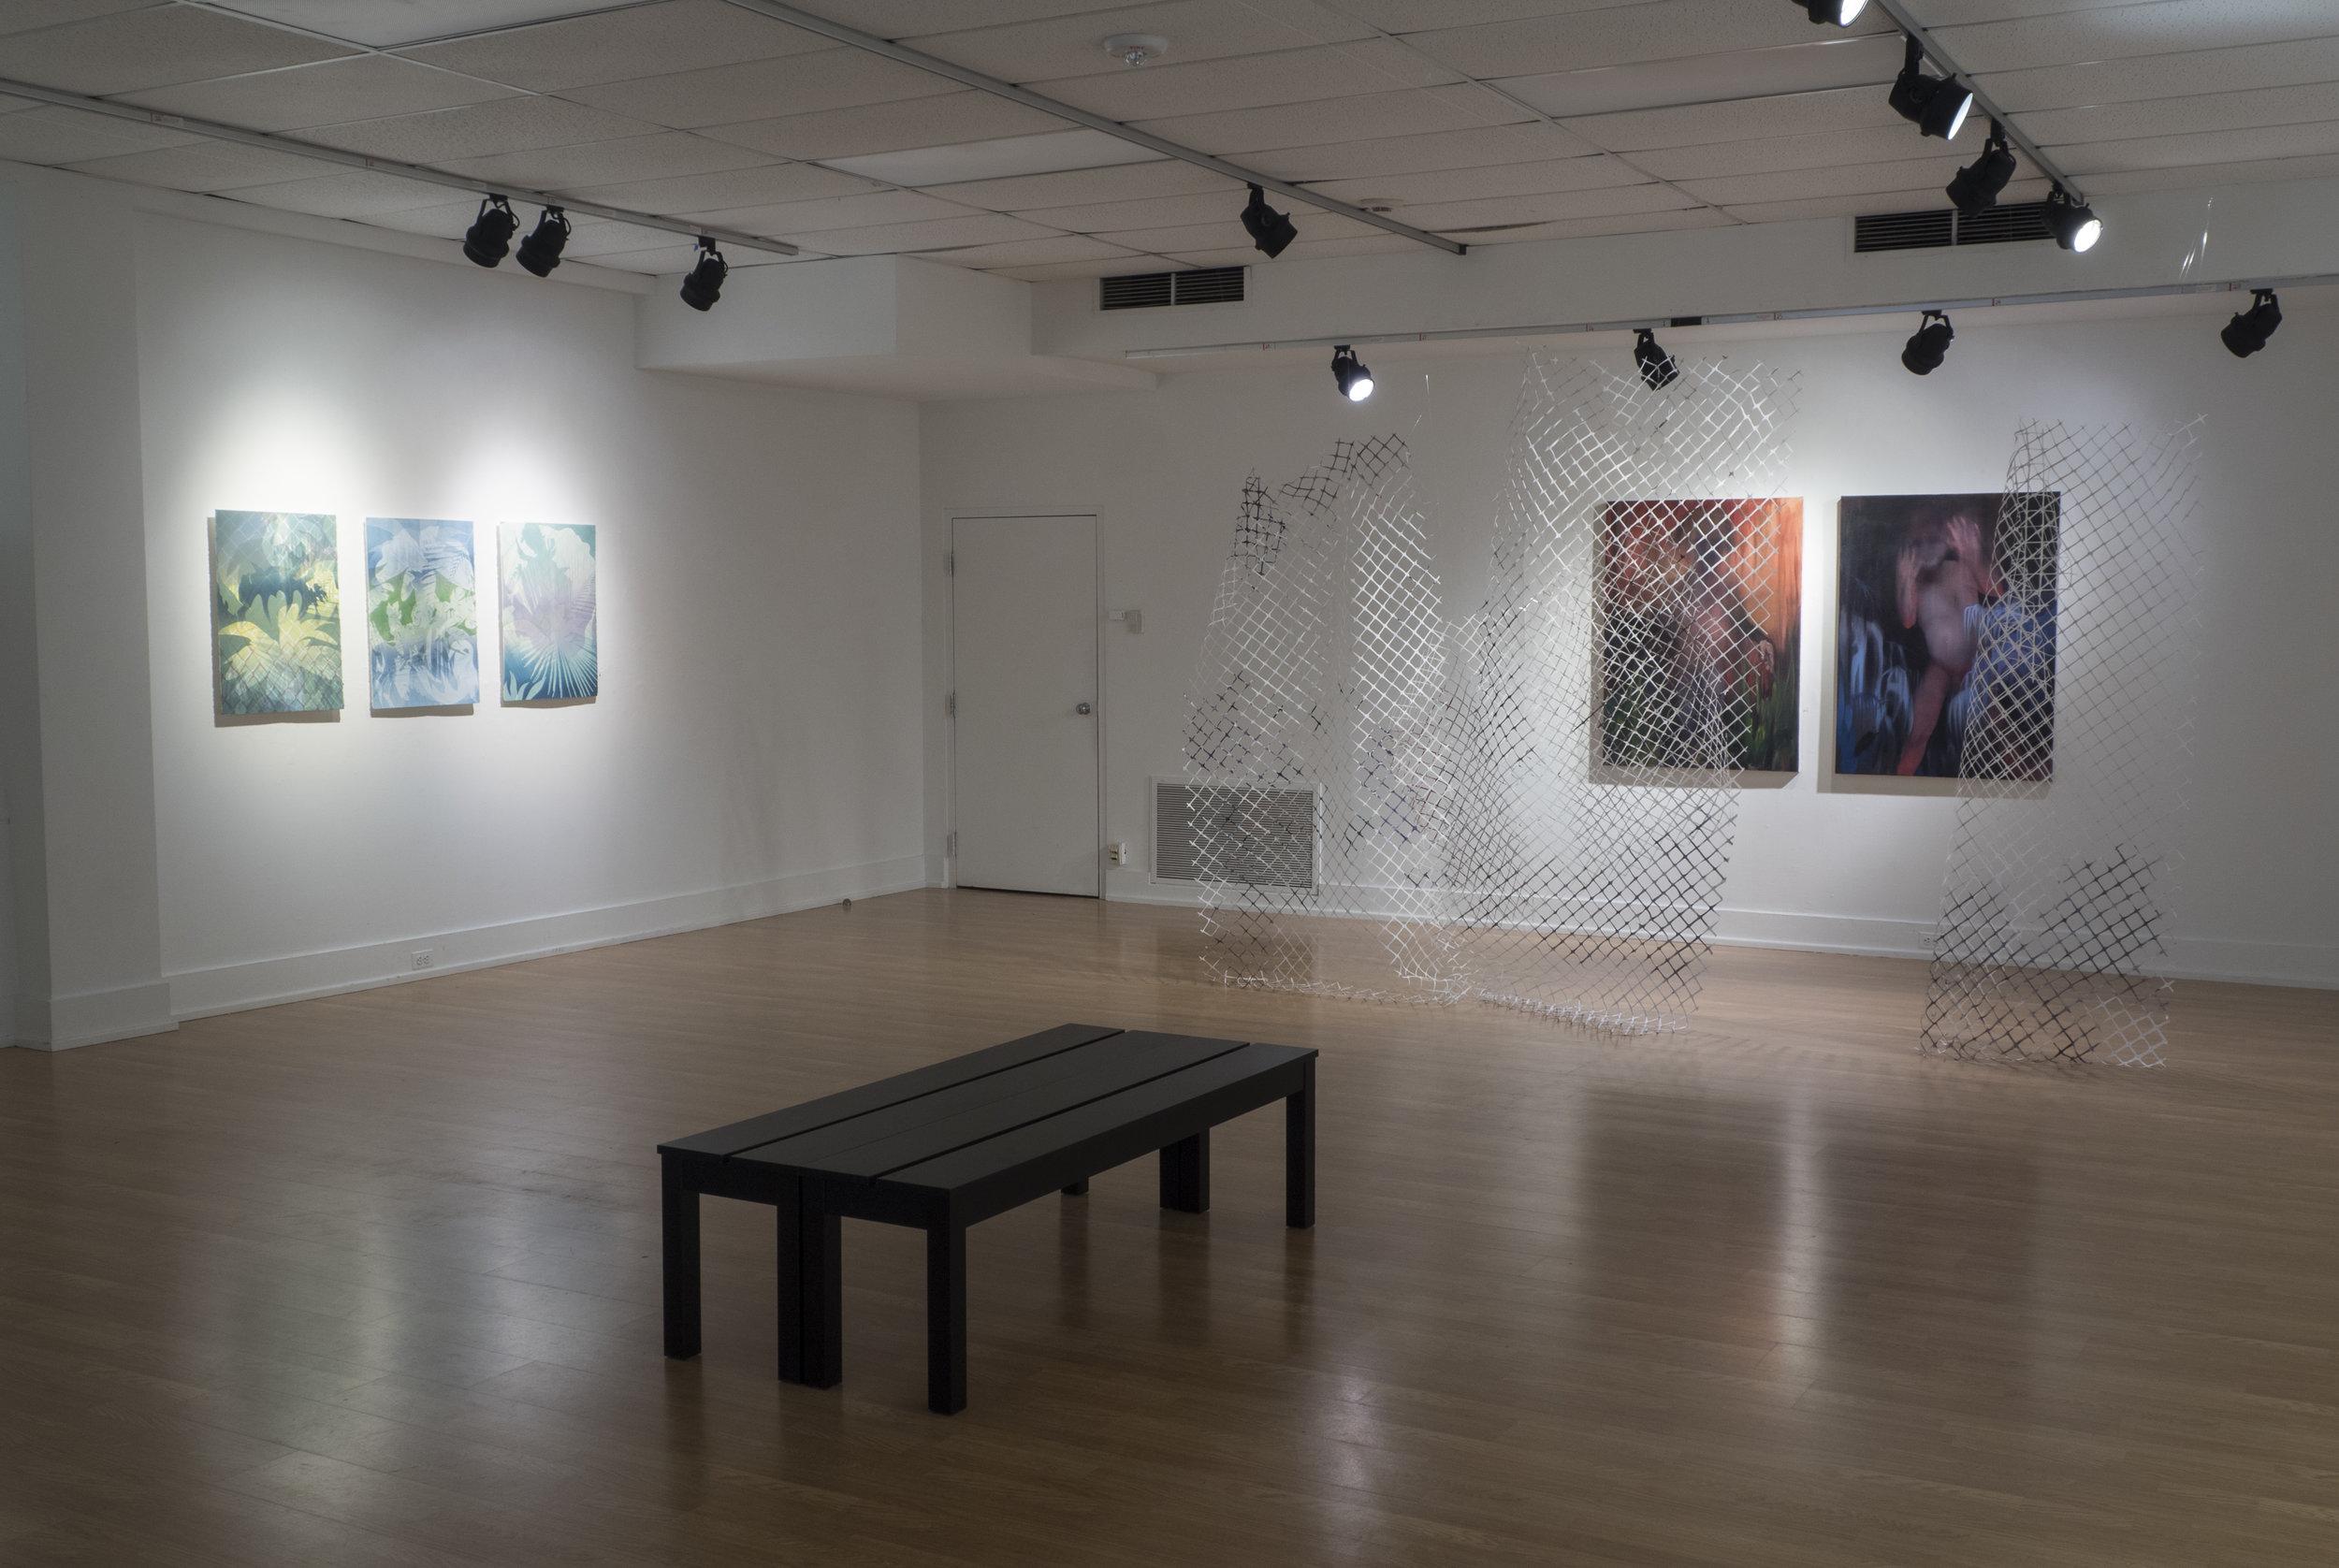 Cora Stafford Gallery